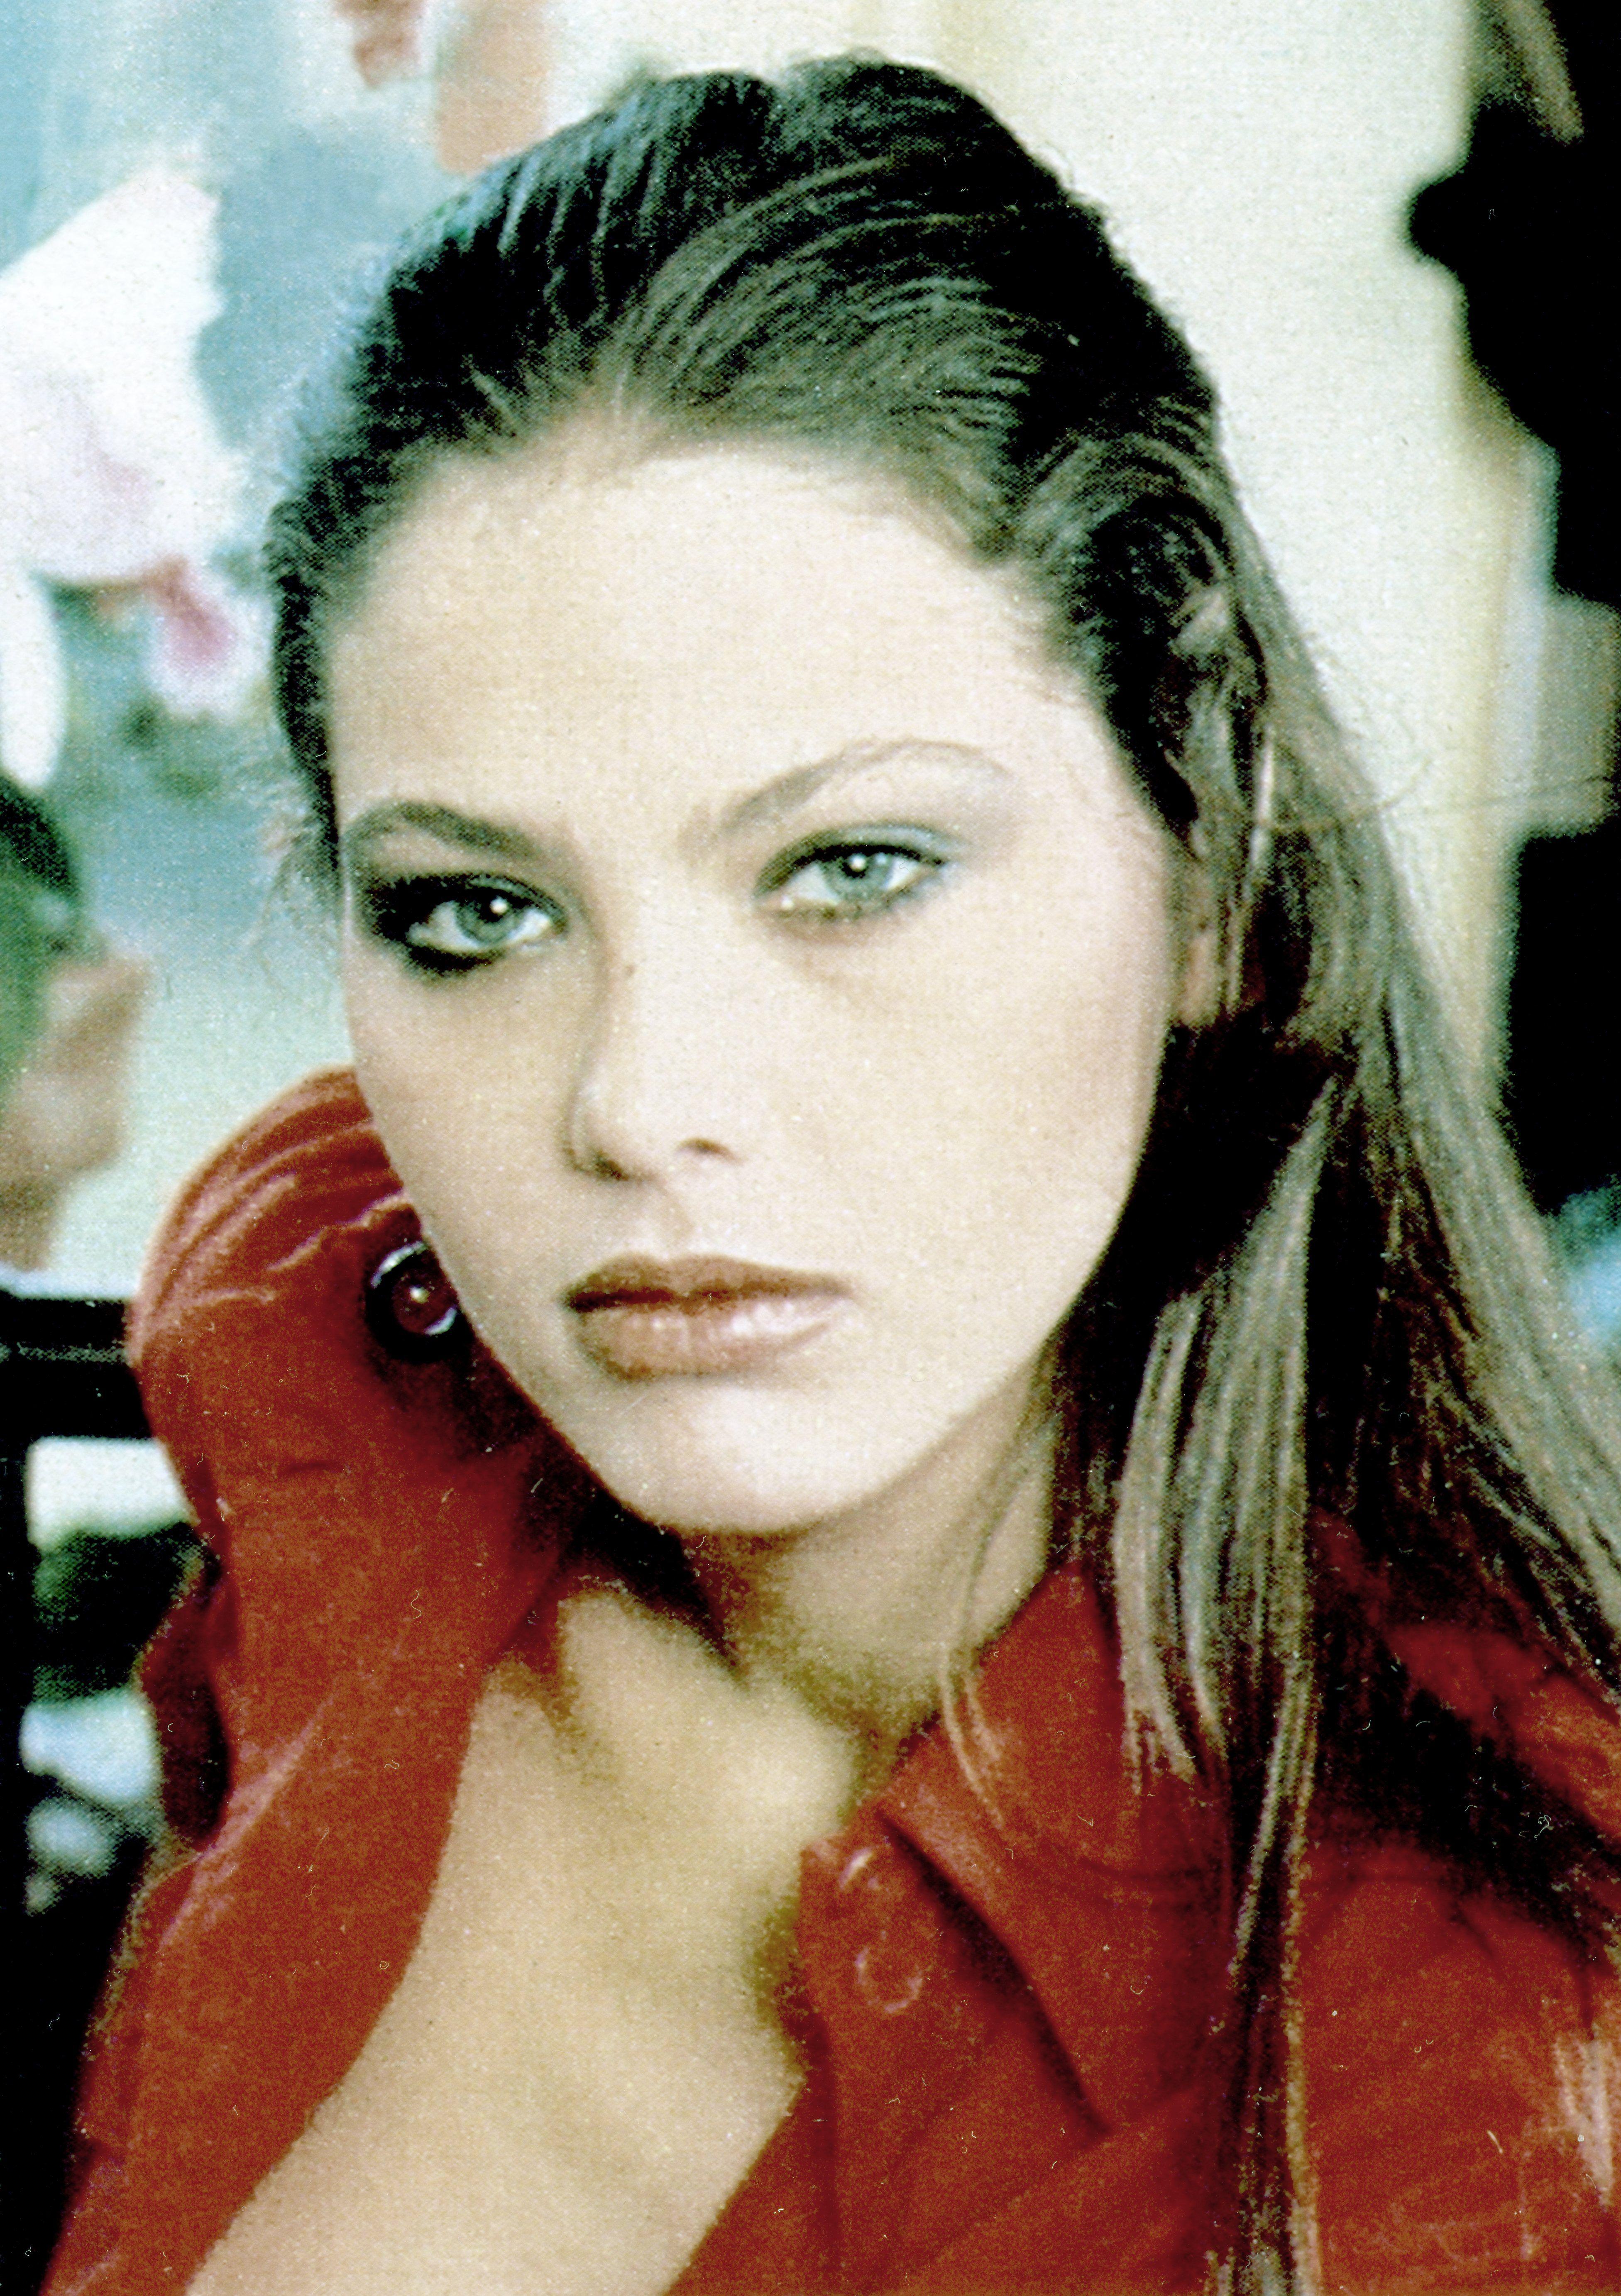 Italian actress Ornella Muti: biography, personal life, movies 88